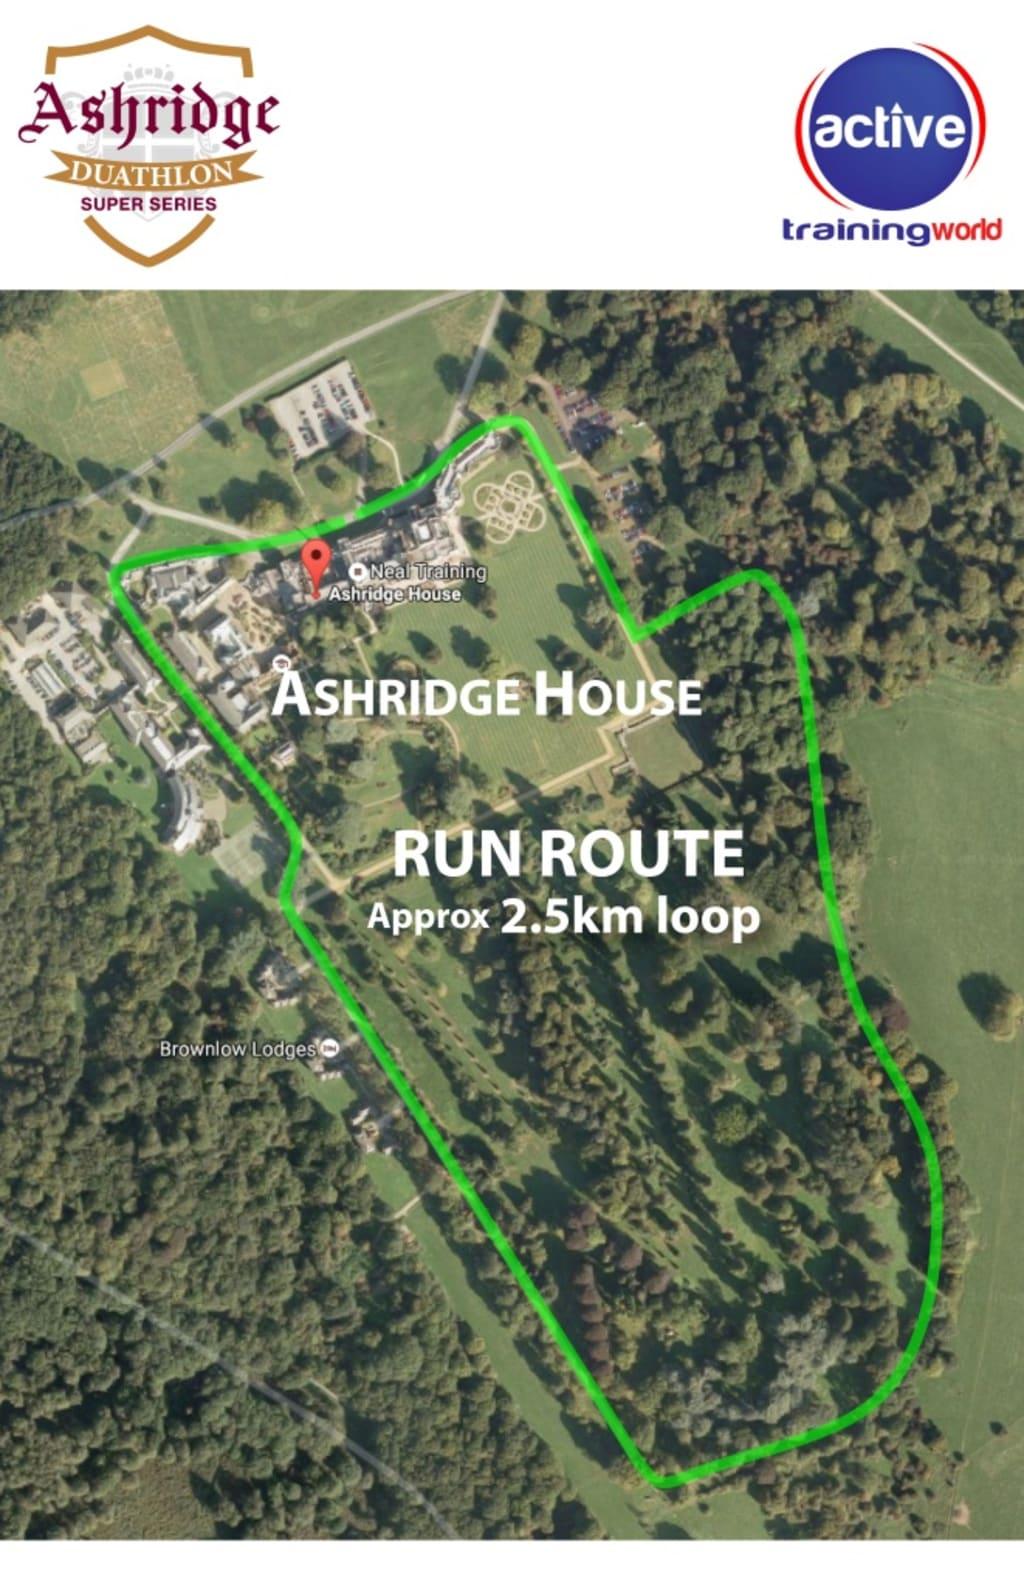 Ashridge-Duathlon-3-Run-Map.jpg